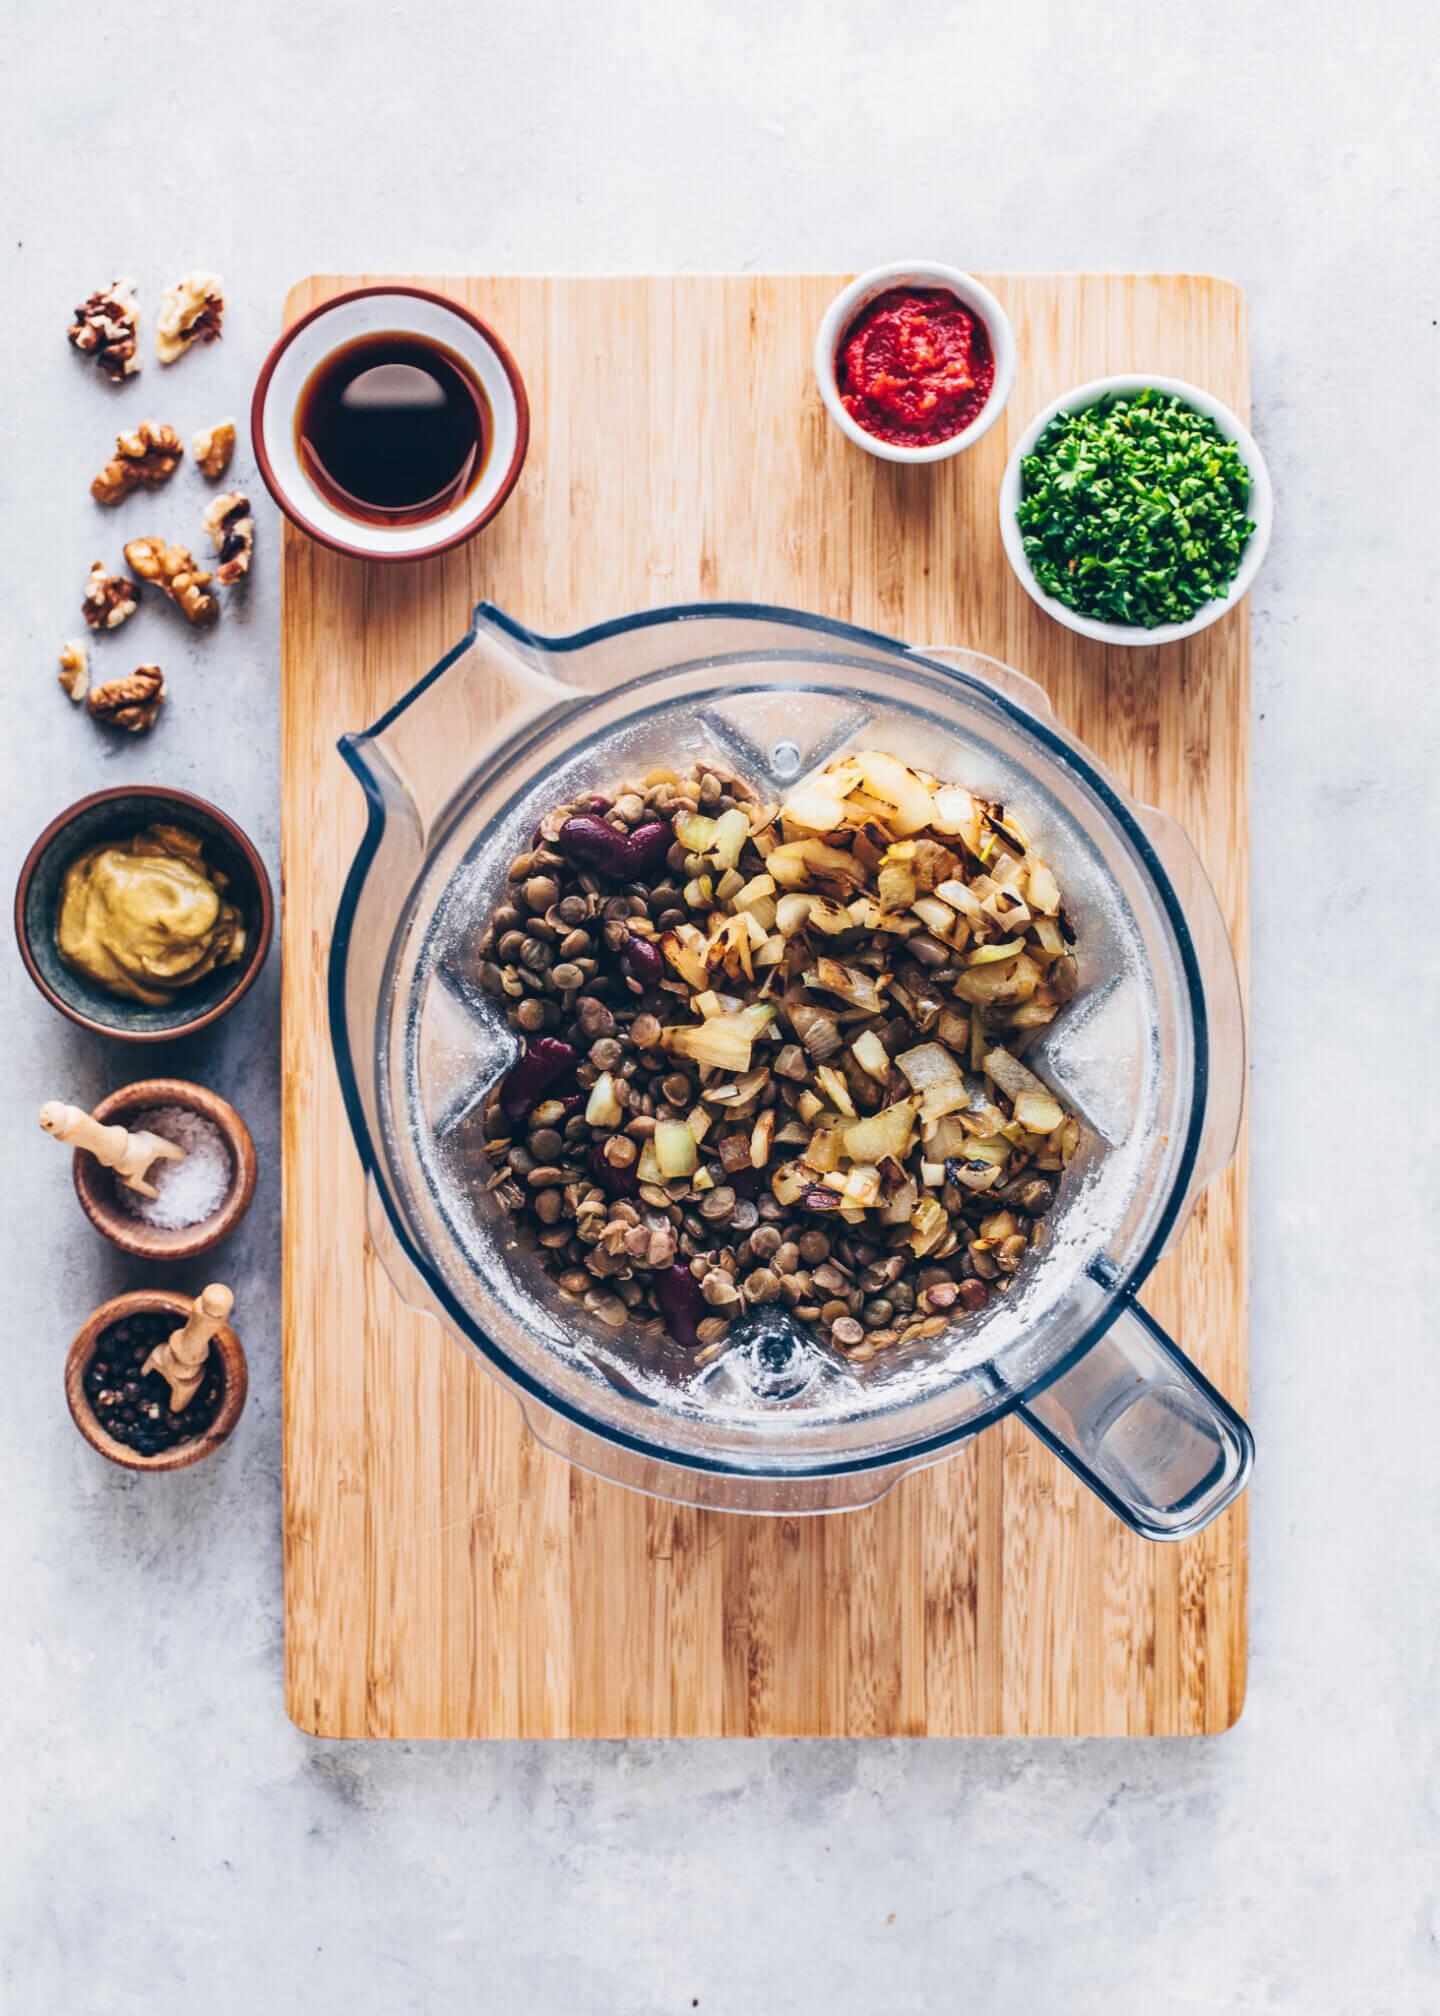 Vegan Meatloaf mixture with Lentils